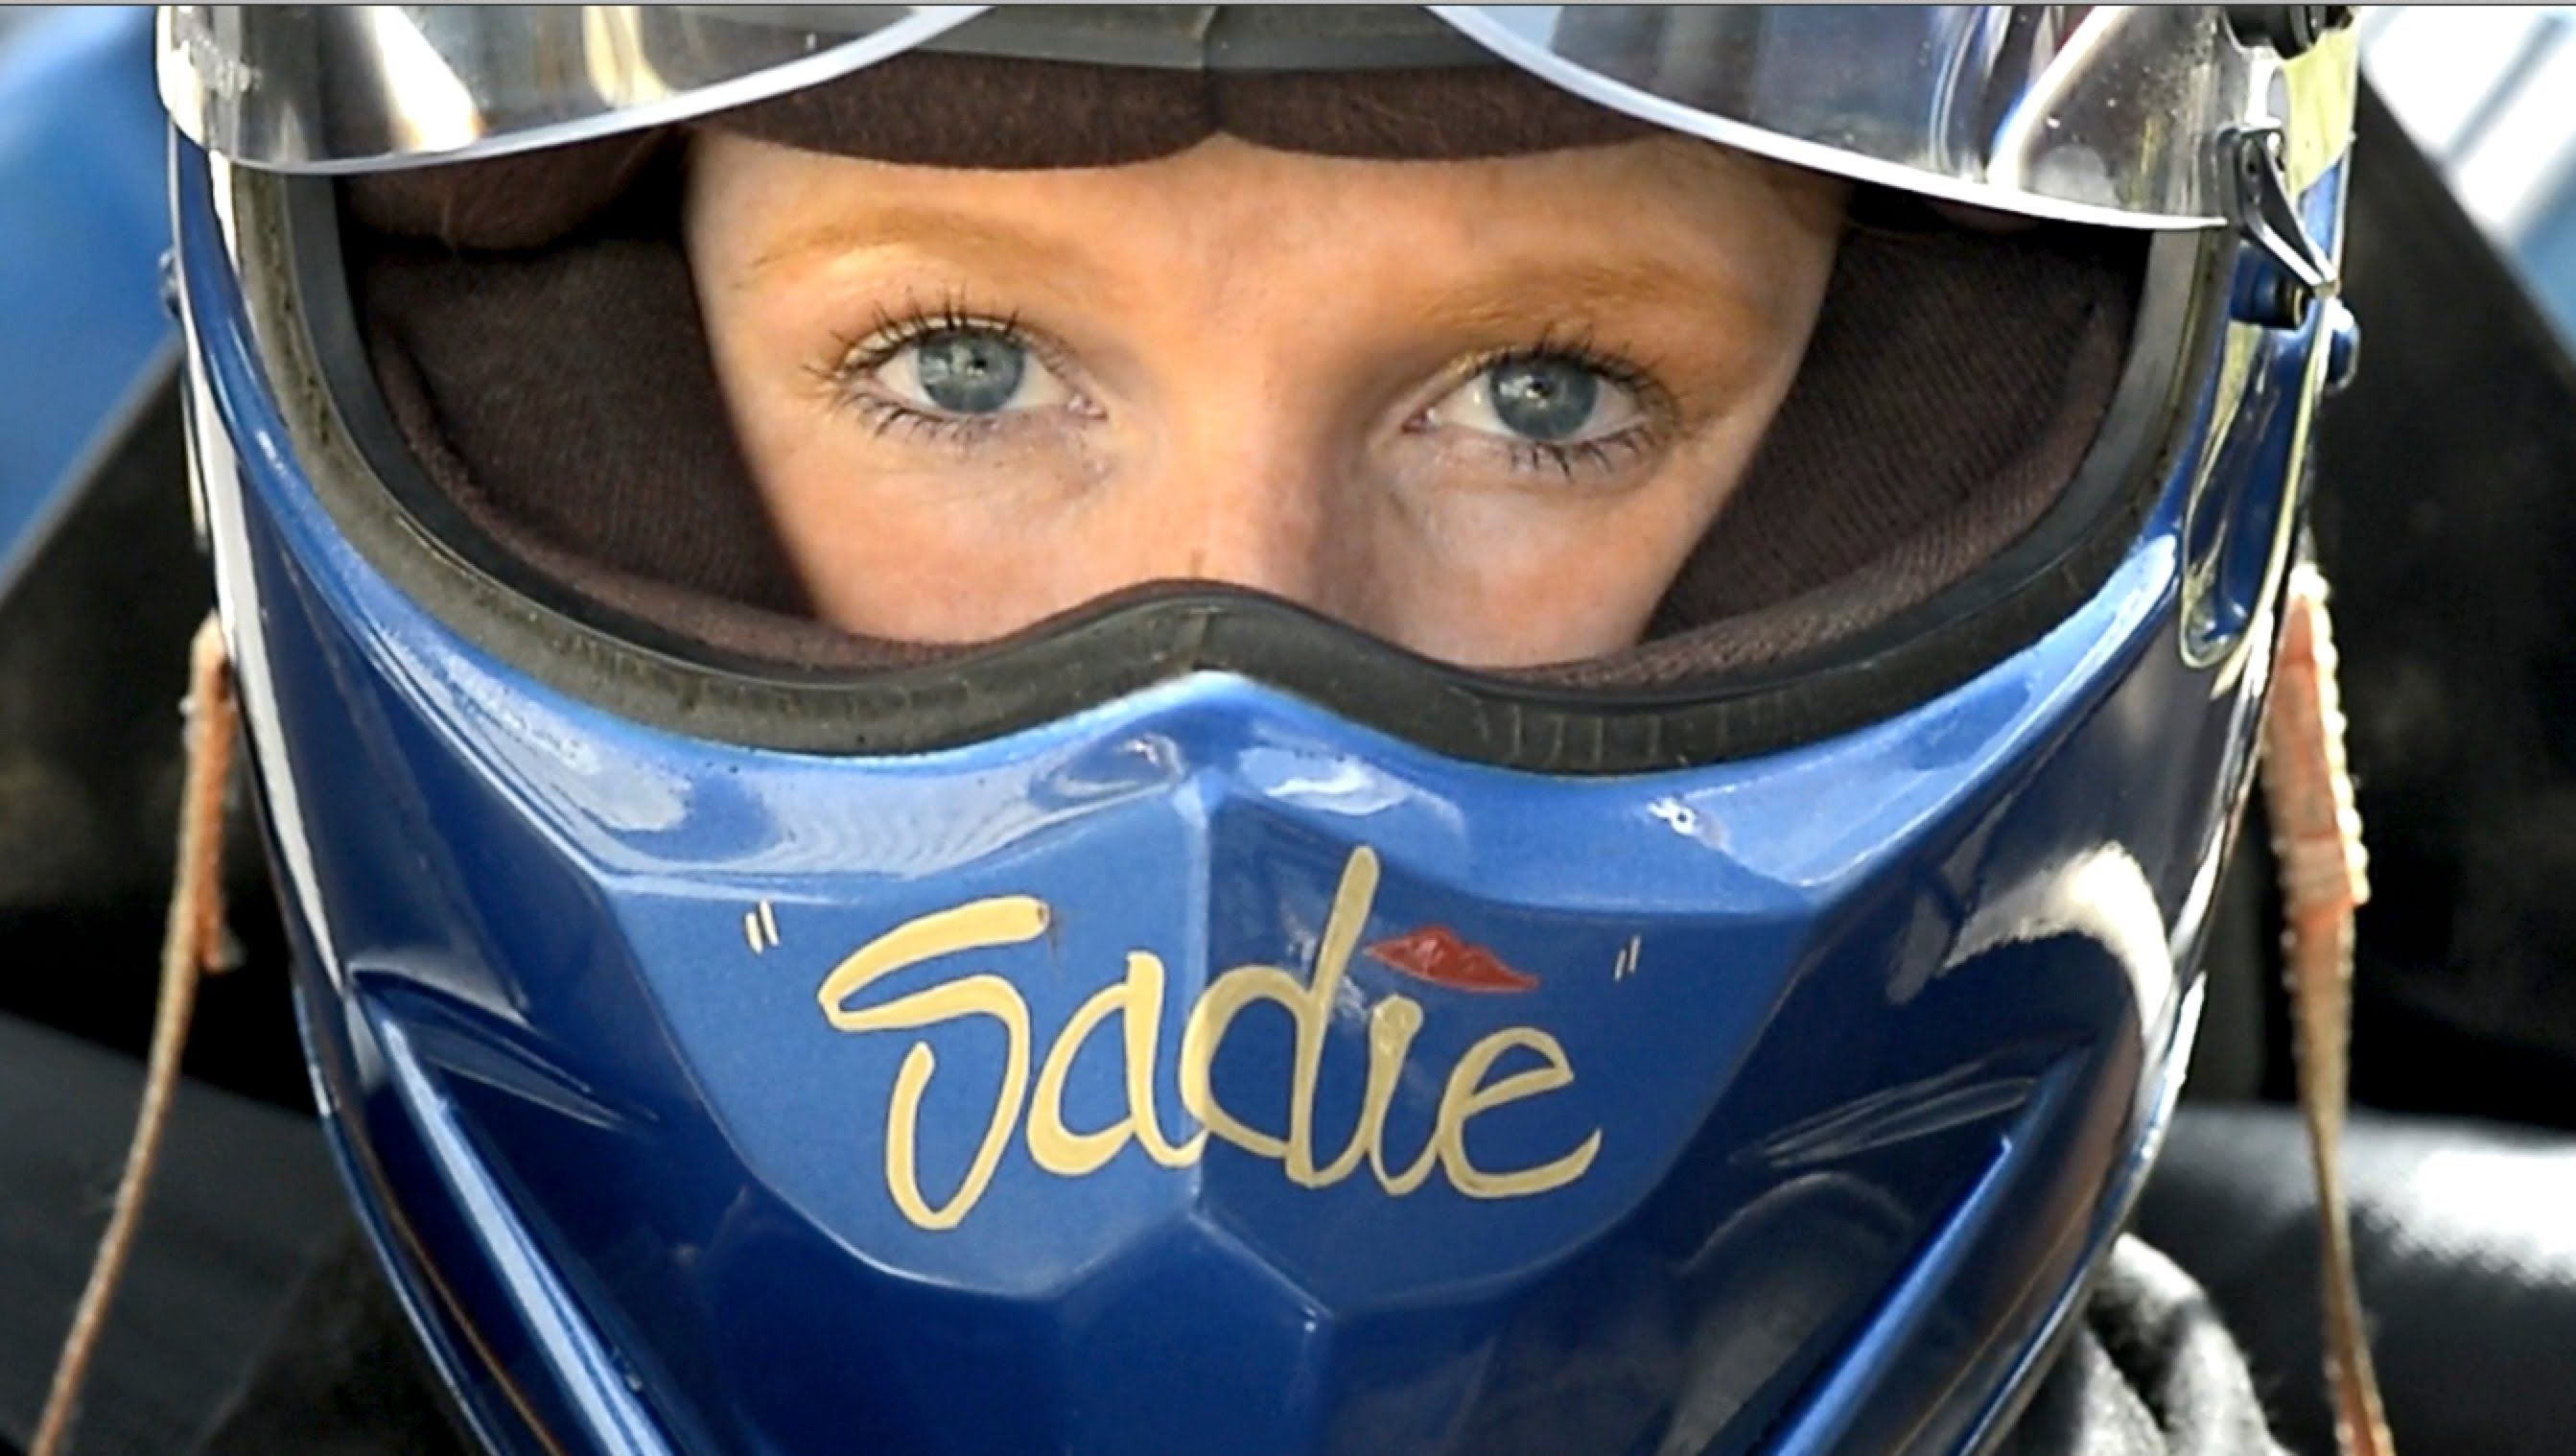 sadie. leukemia survivor. dragster driver. Thank you for